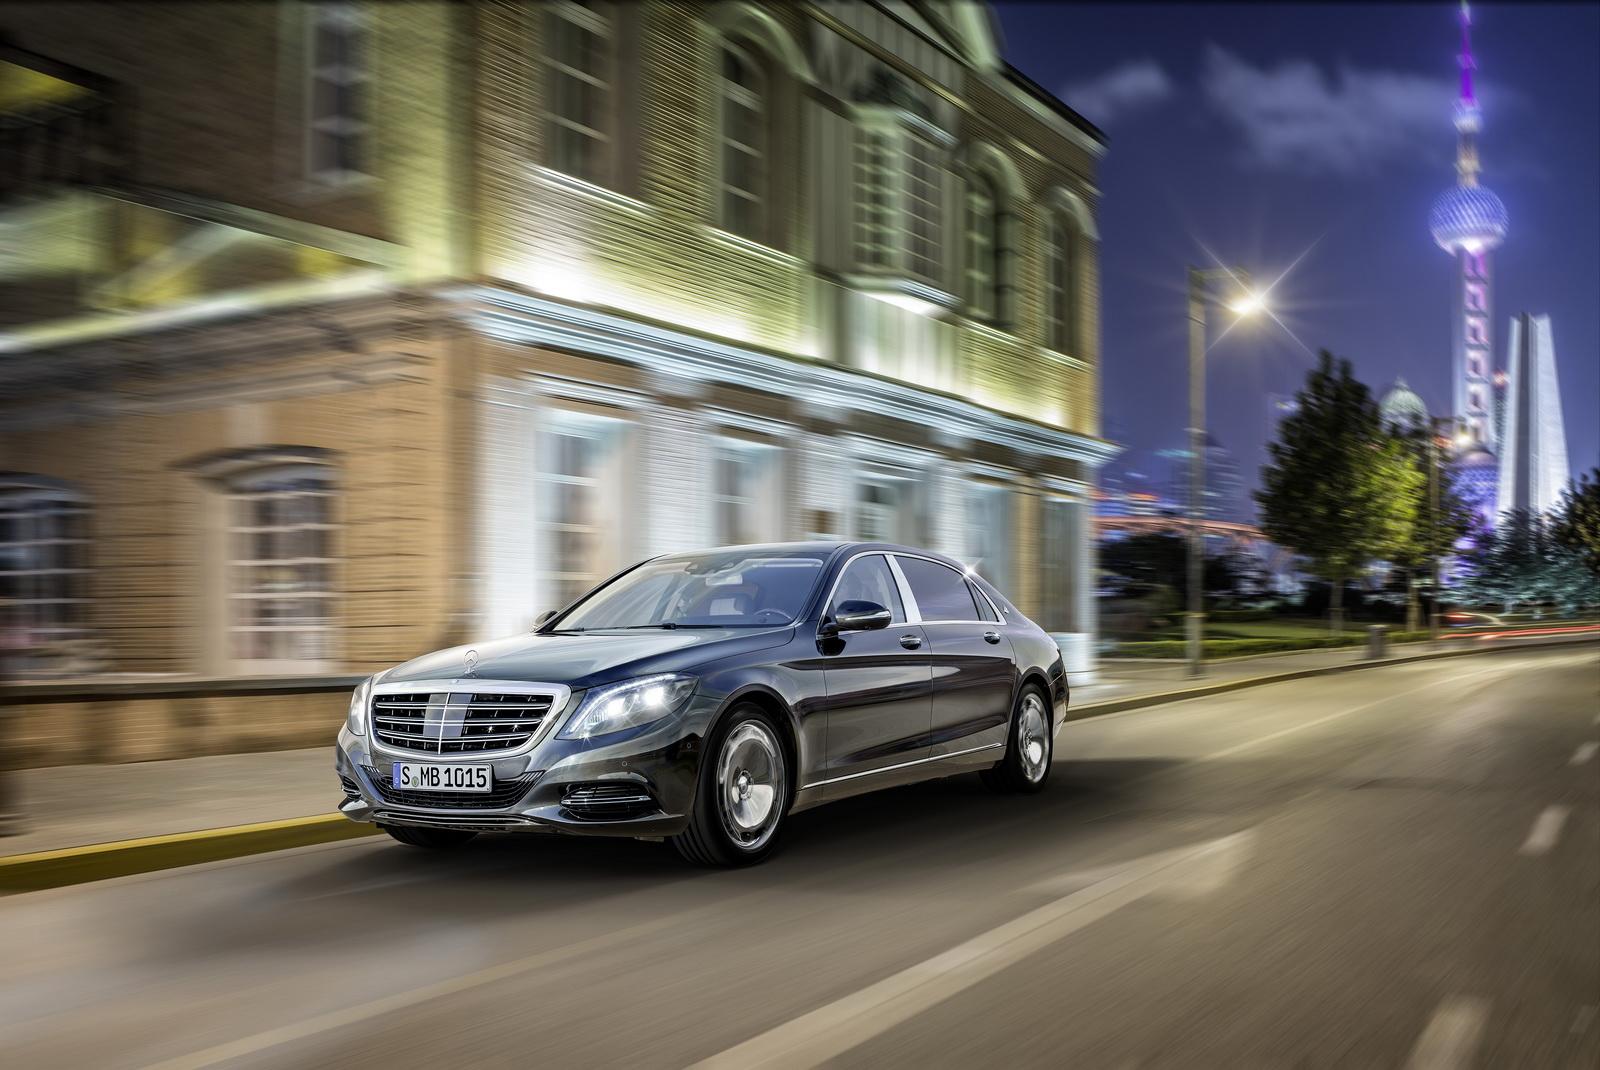 Mercedes benz officially captures u s luxury sales crown for Crown mercedes benz